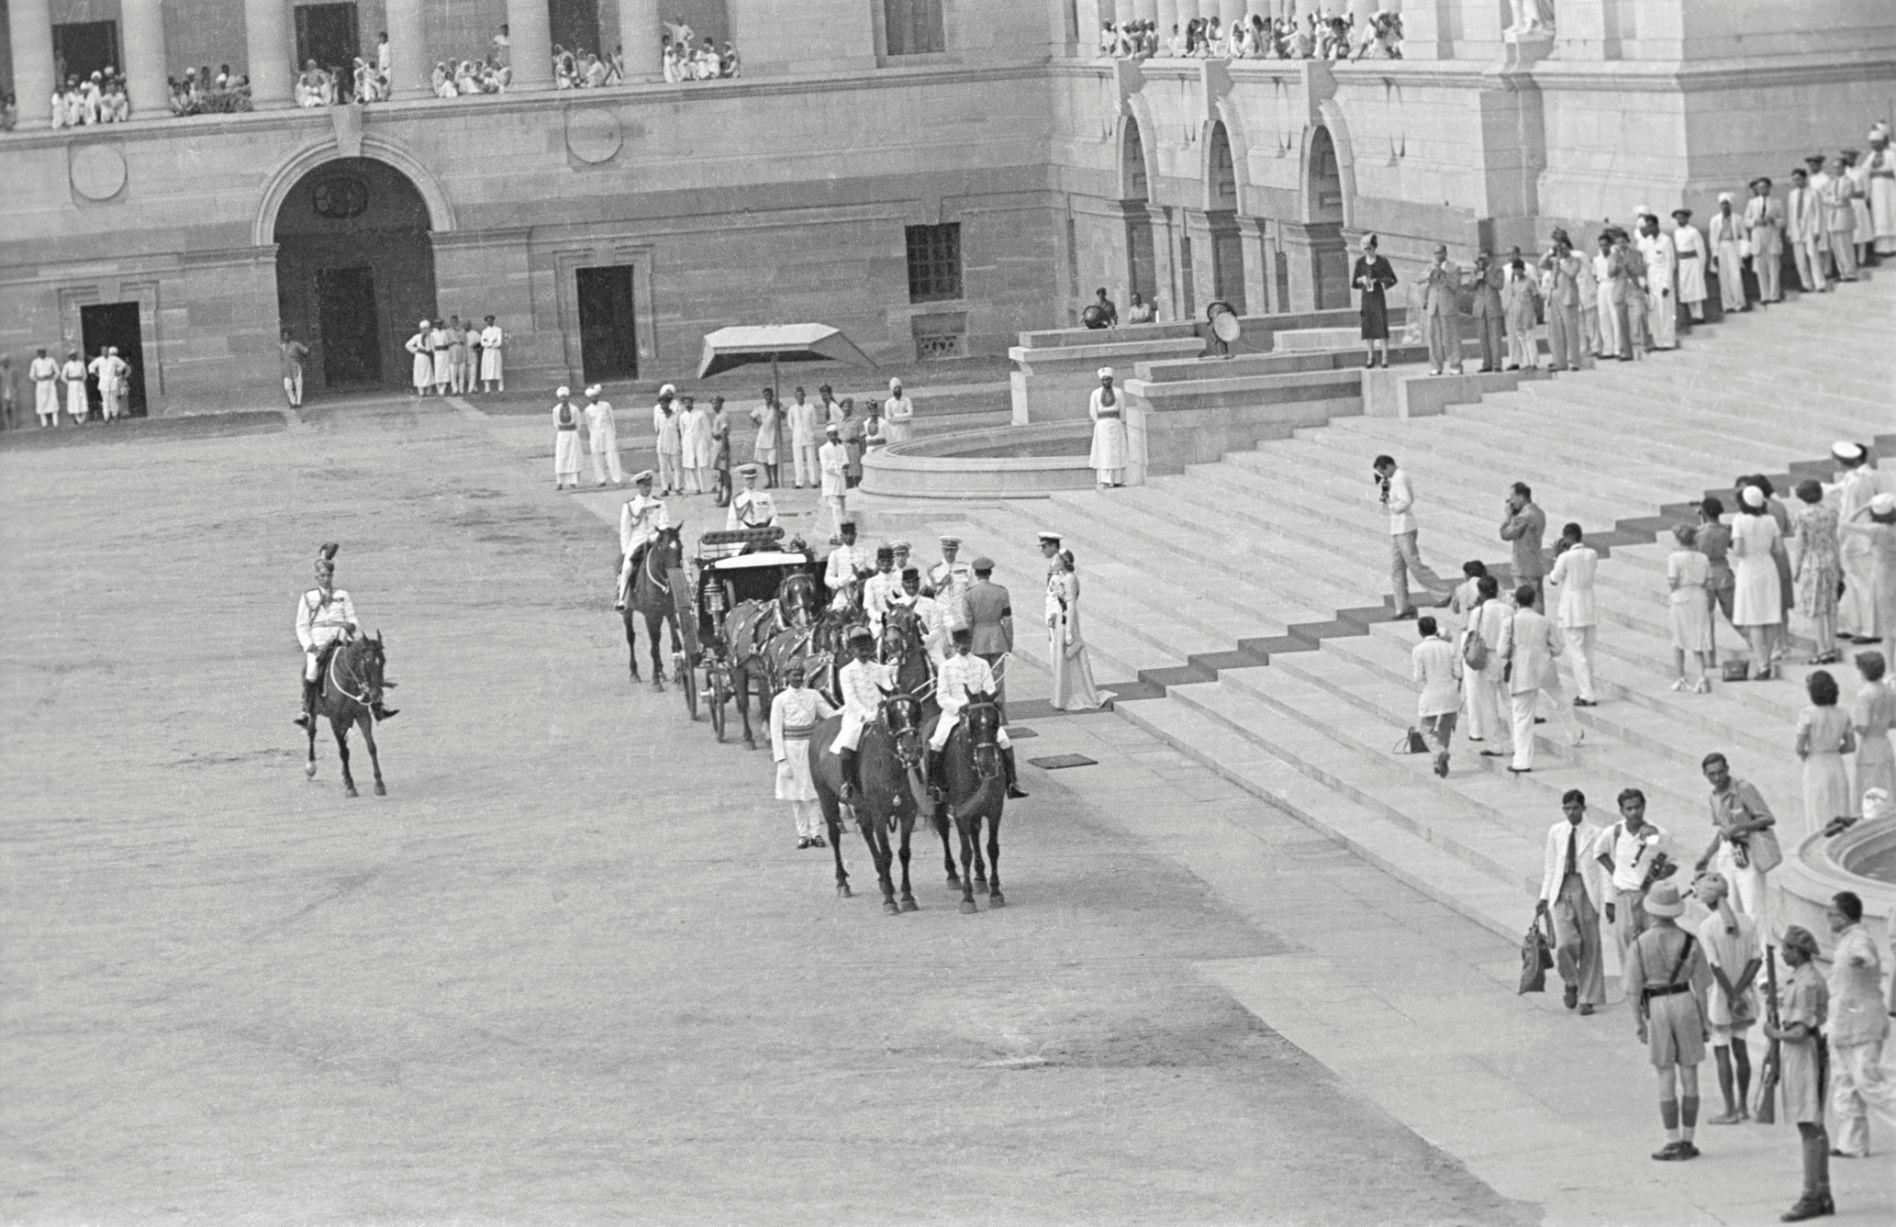 The Mountbattens ceremoniously leaving India, 1947. Photo: Bert Scott.